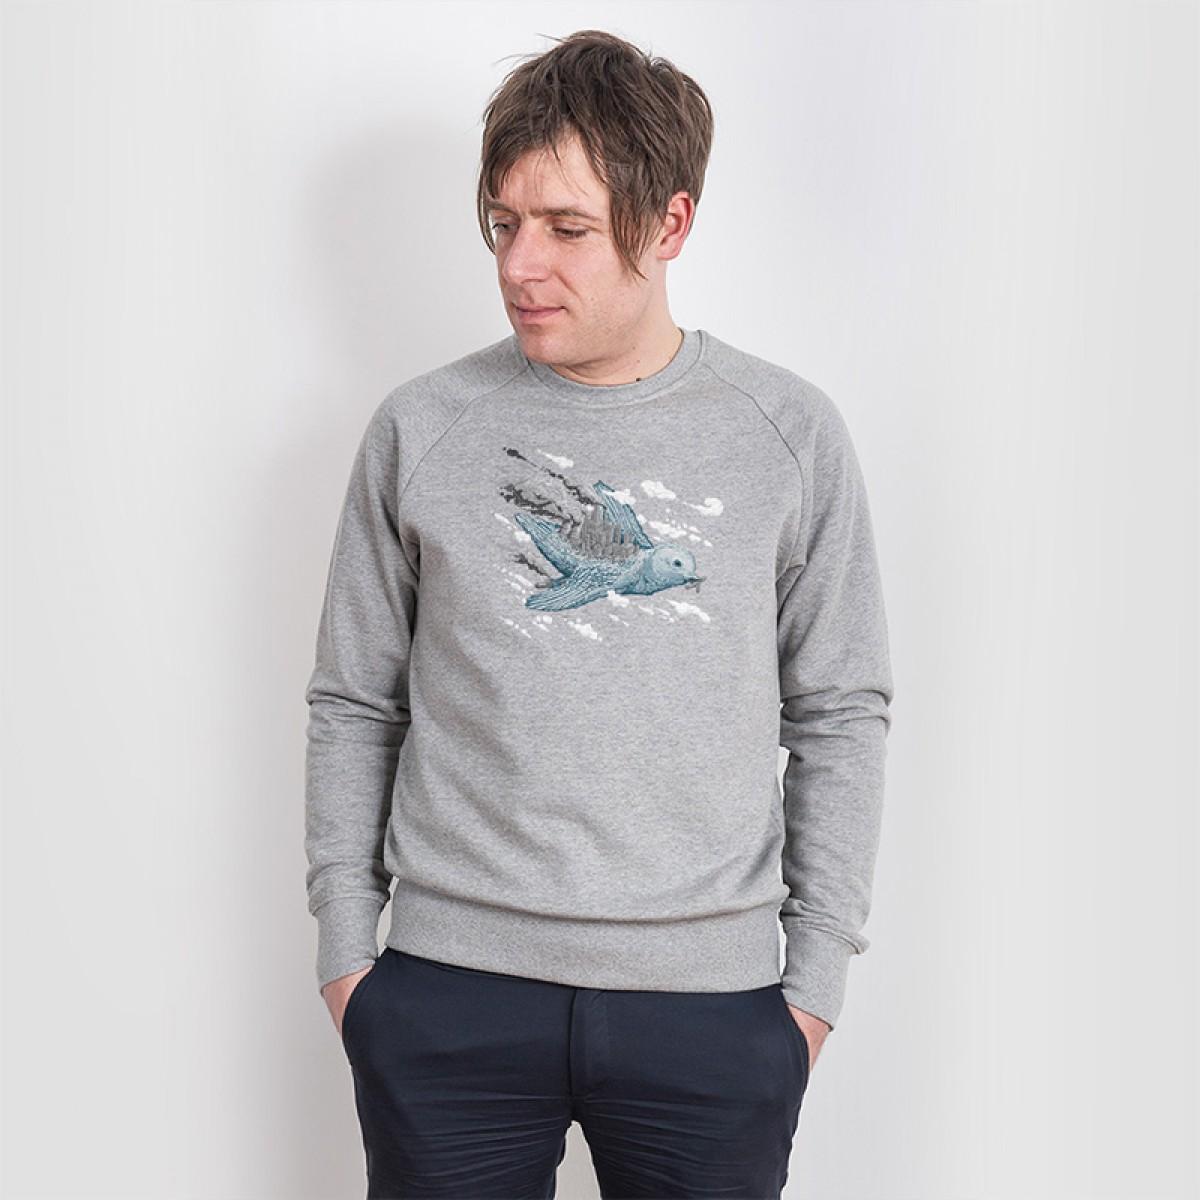 Robert Richter – Clean the World - Bird - Organic Cotton Sweatshirt